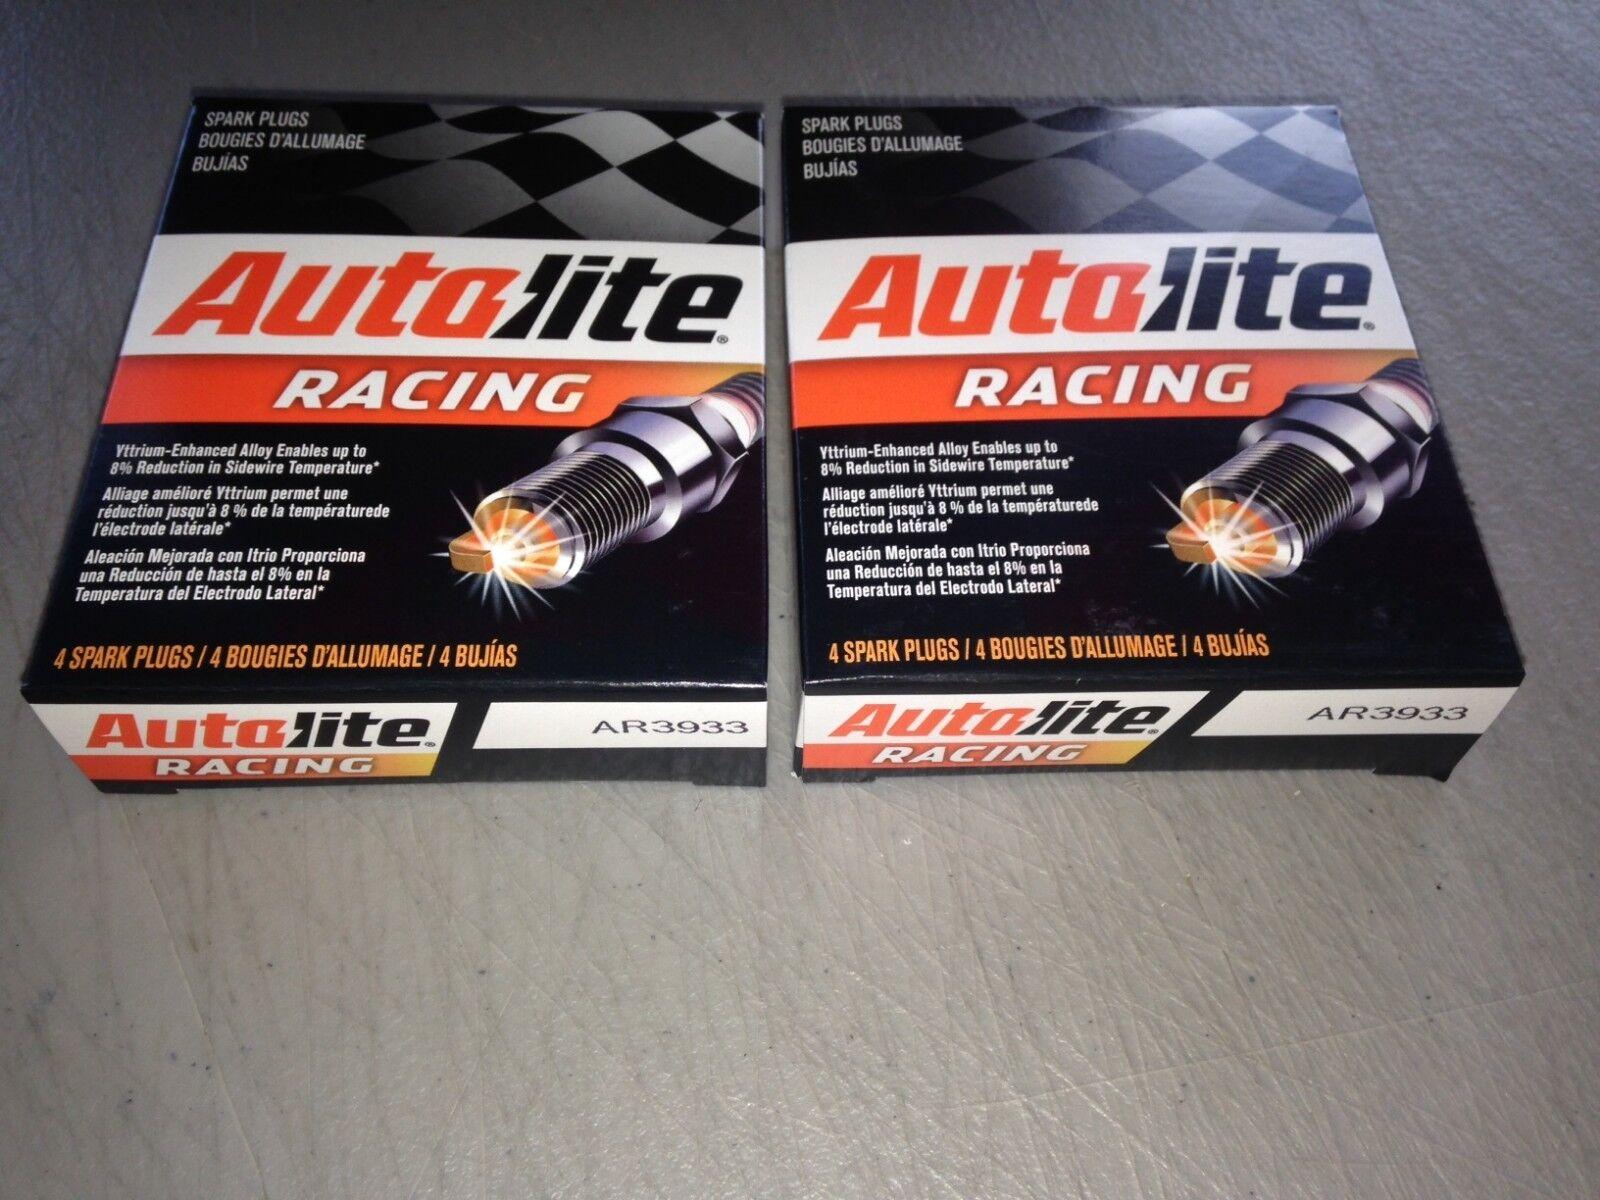 Candela X Escort eight(8) autolite ar3933 racing spark plug set fits champion c59cx ngk r5671a9